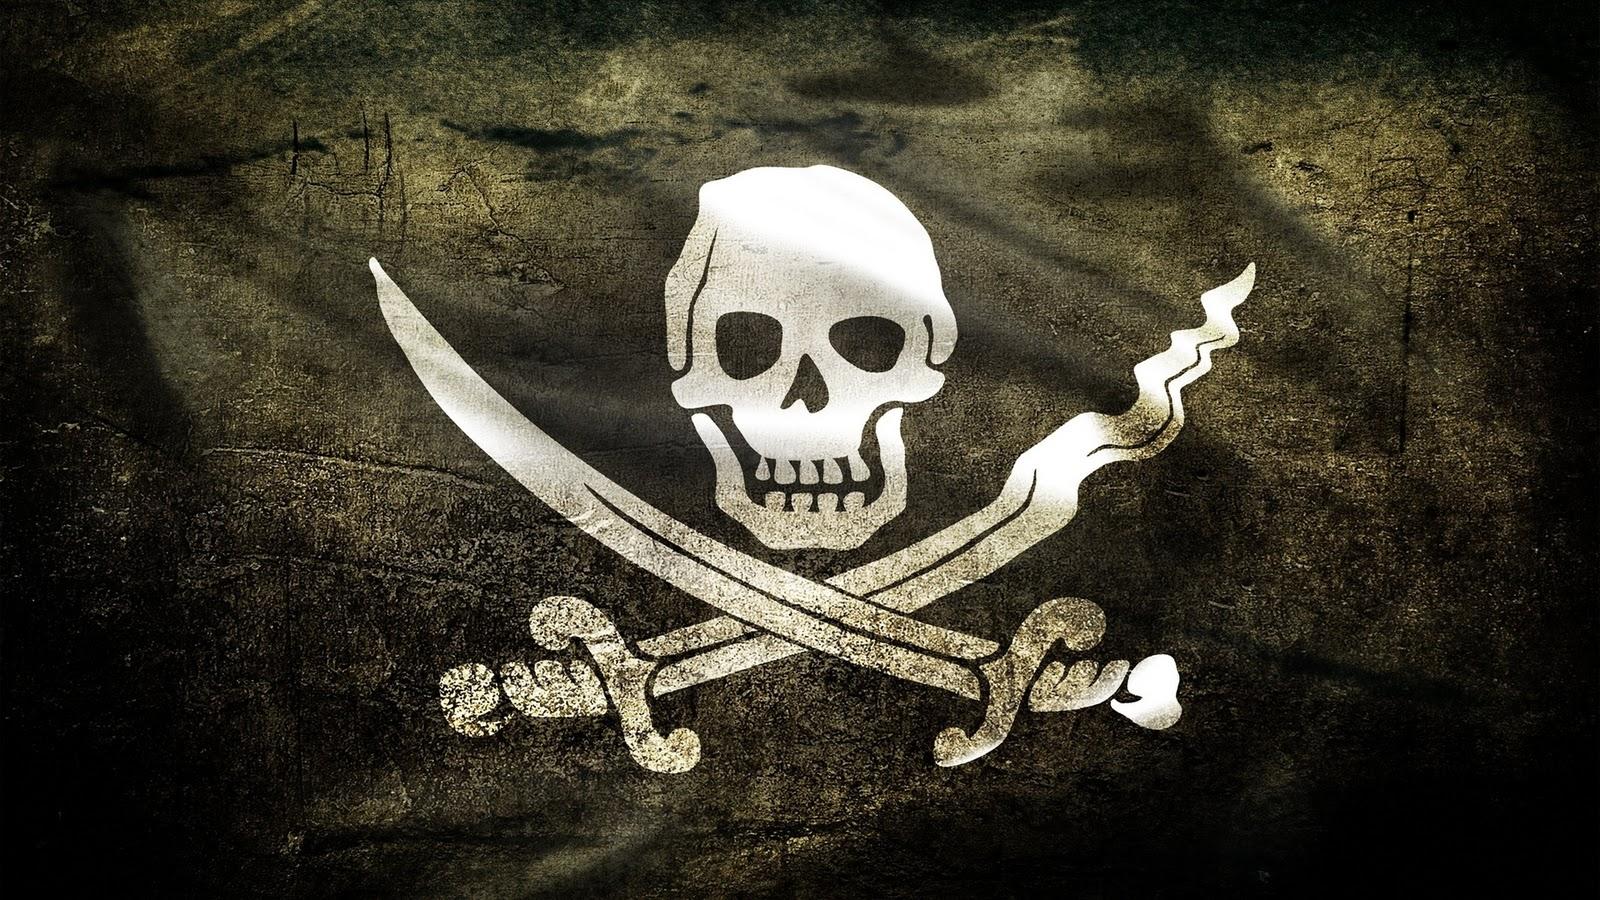 http://4.bp.blogspot.com/-5NGlw4jgD0E/TqPQJOsx41I/AAAAAAAACpE/T4bm487NQ3Q/s1600/Skull+_wallpapers_Pirate_Skull_Flag.jpg